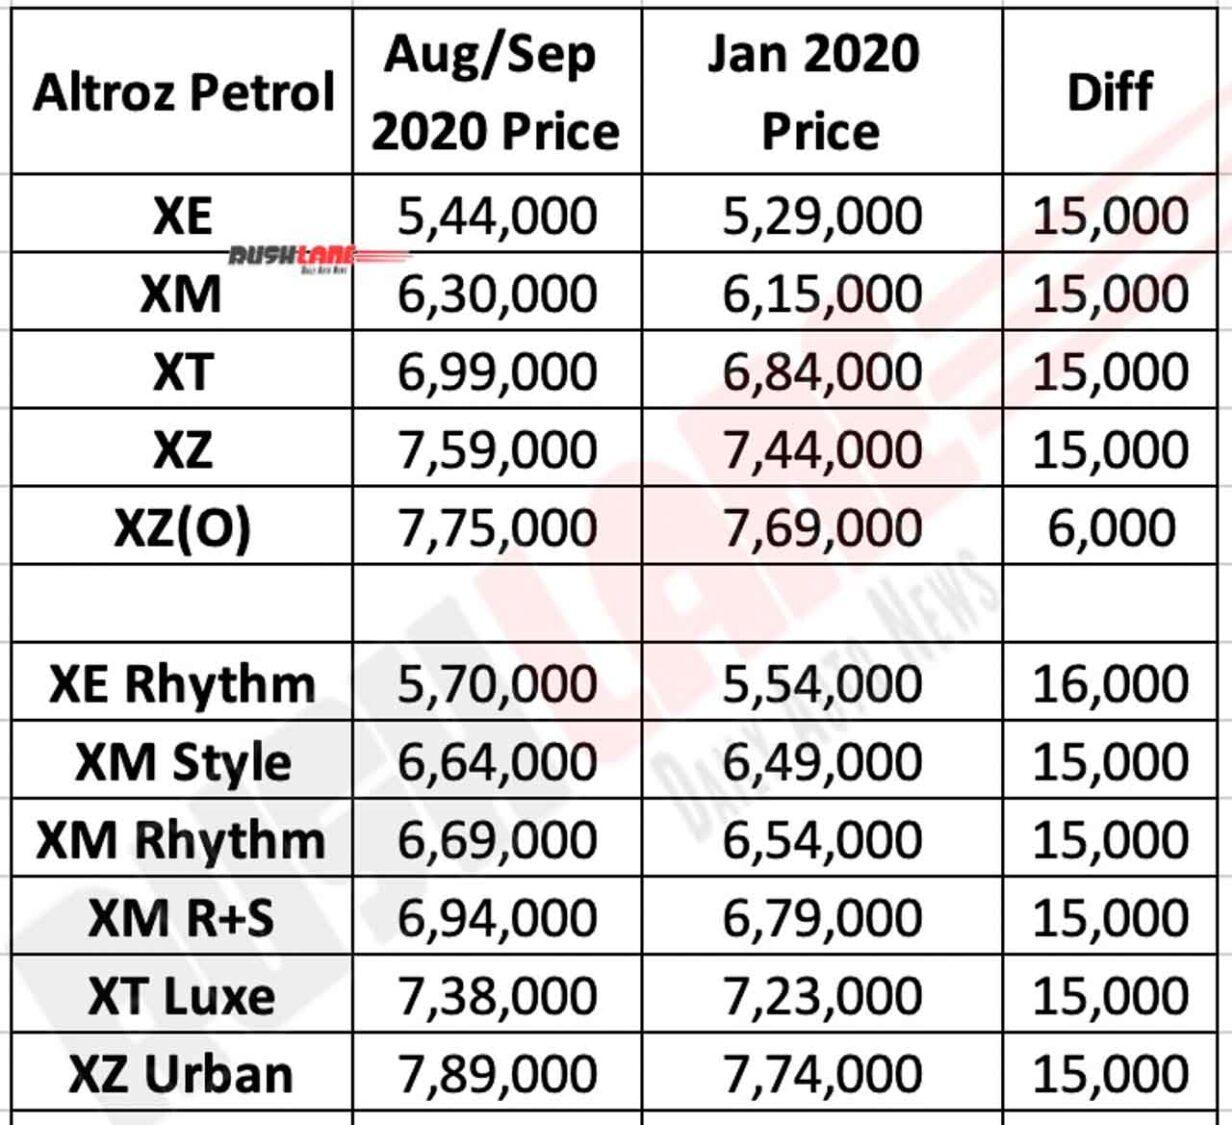 Tata Altroz Petrol Prices Sep 2020